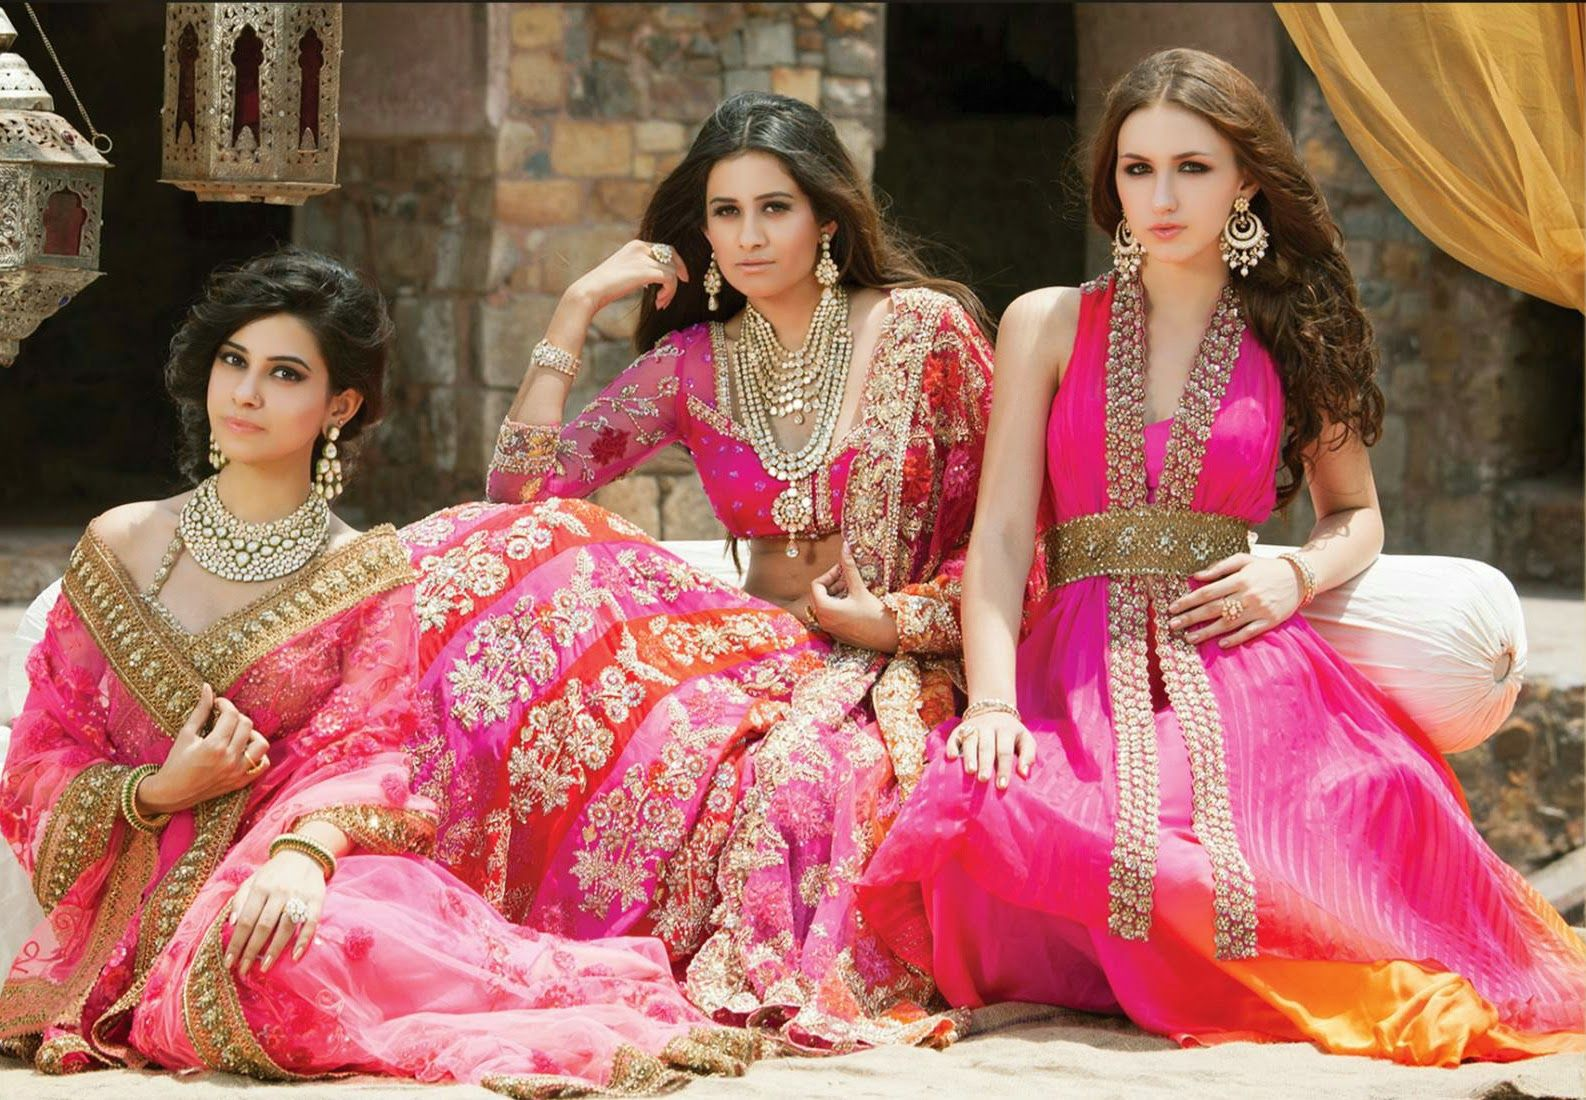 Bridal Wear Inspiration at Bridal Asia - Asian Wedding Ideas ...